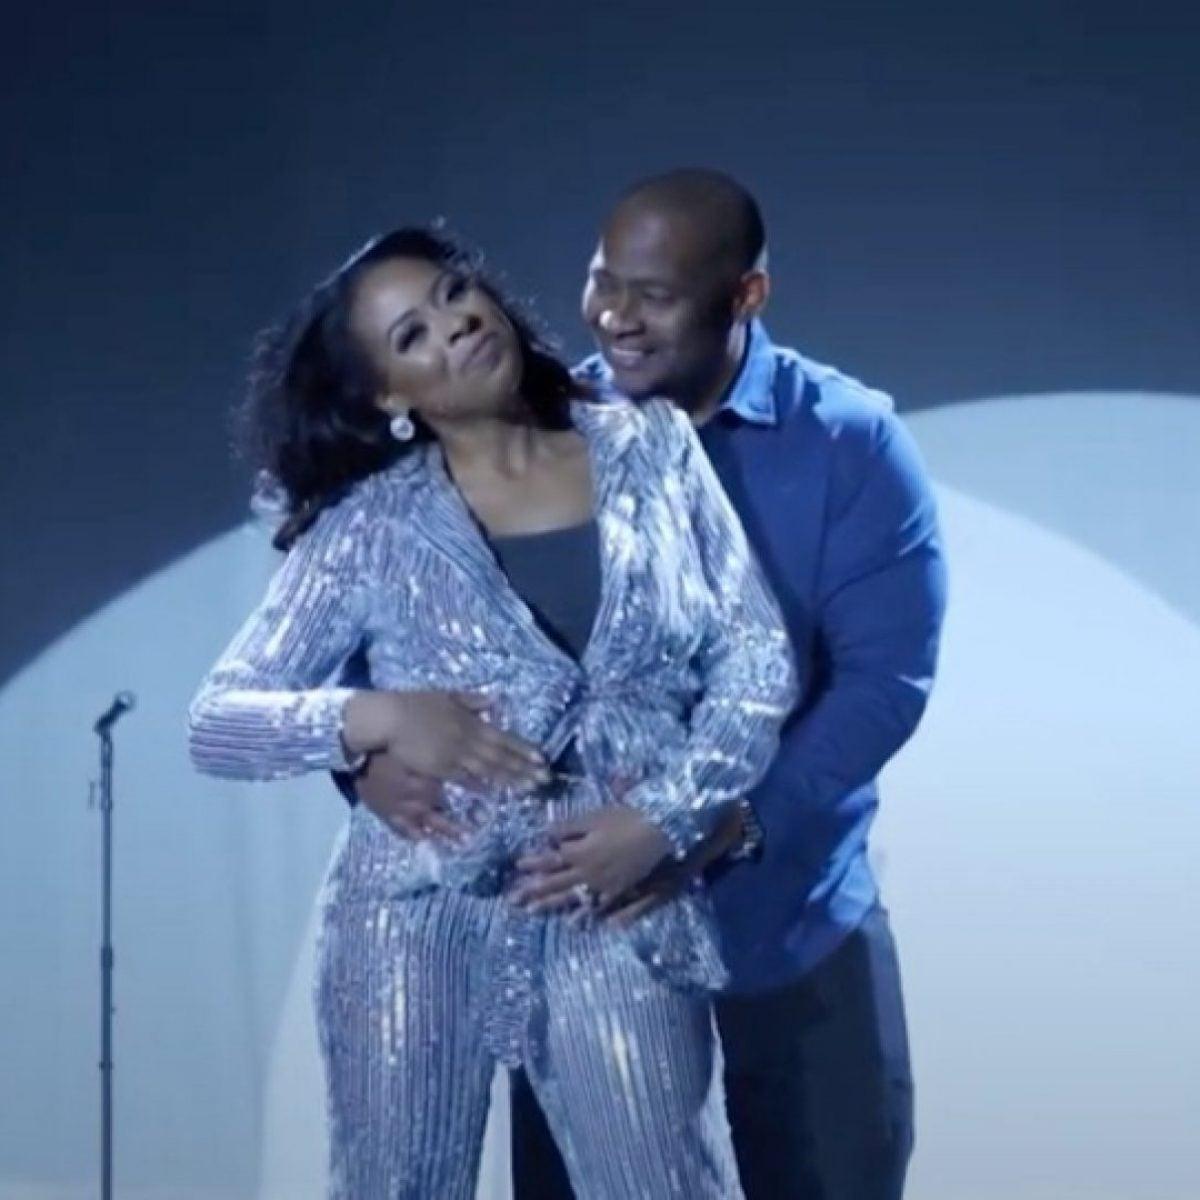 Expectant Mom Recreates Beyoncé's 'Love On Top' MTV Performance For Pregnancy Announcement Video